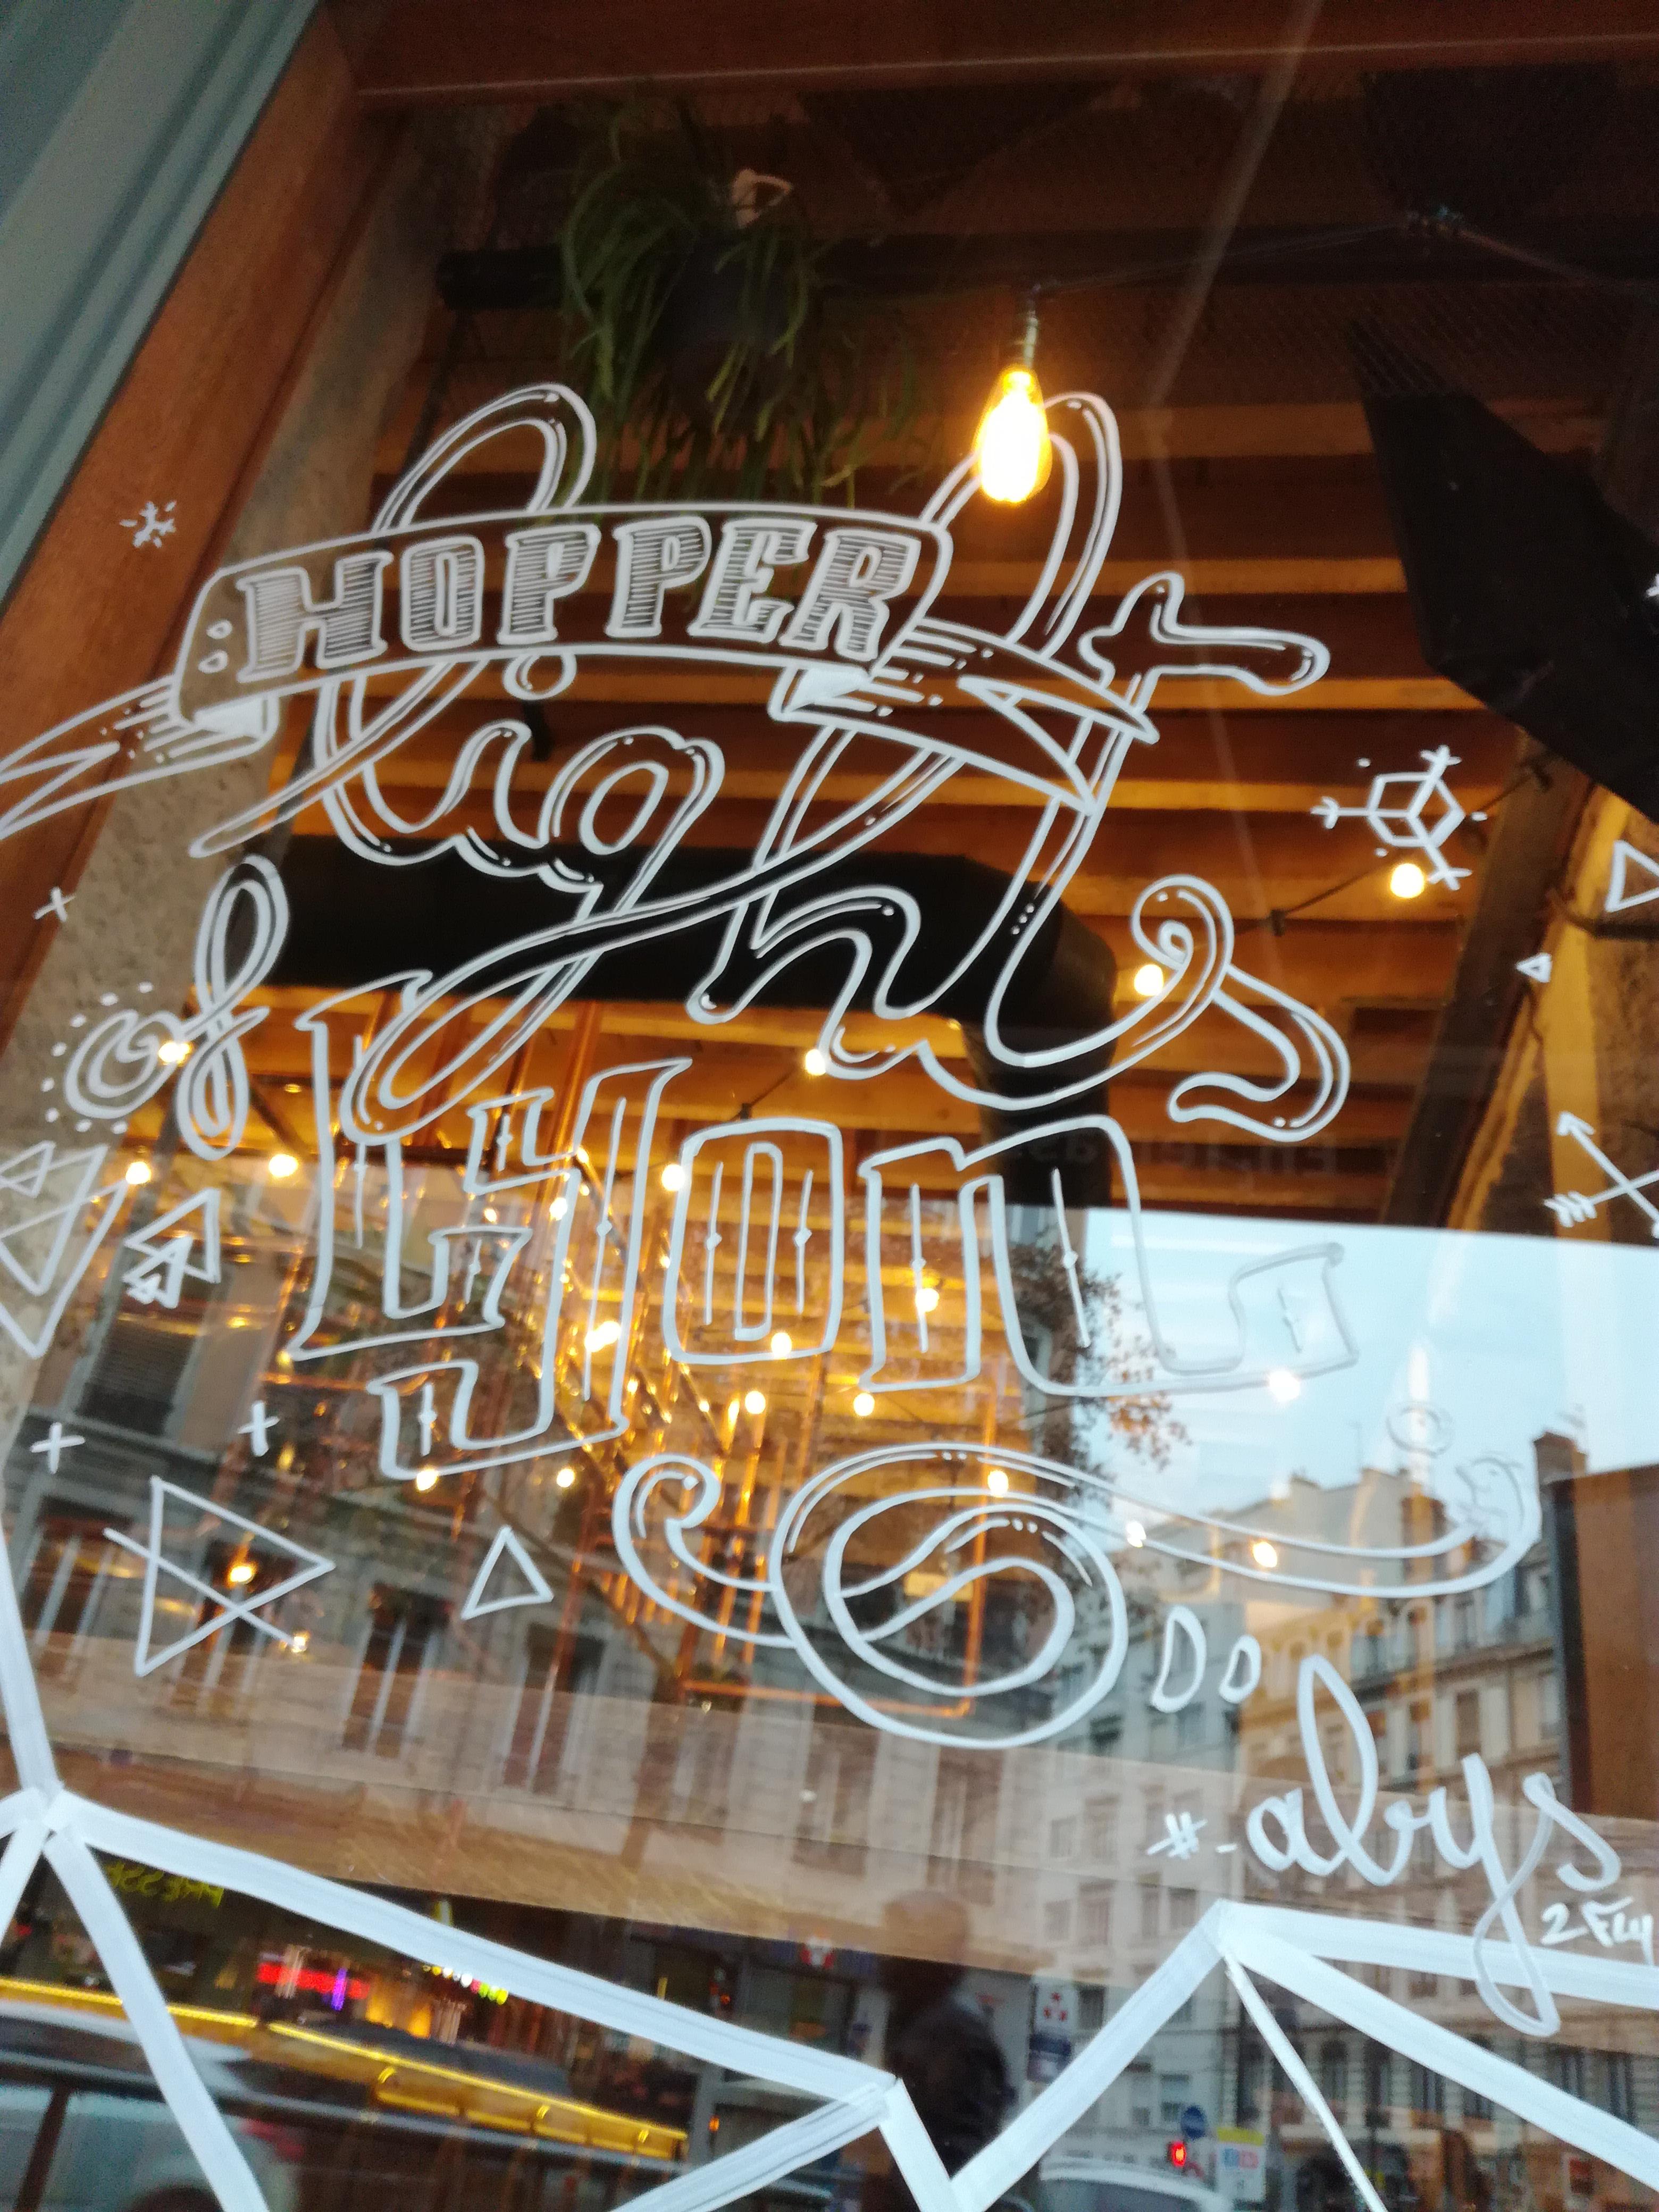 abys - da lyon -illustration vitrine deco hopper